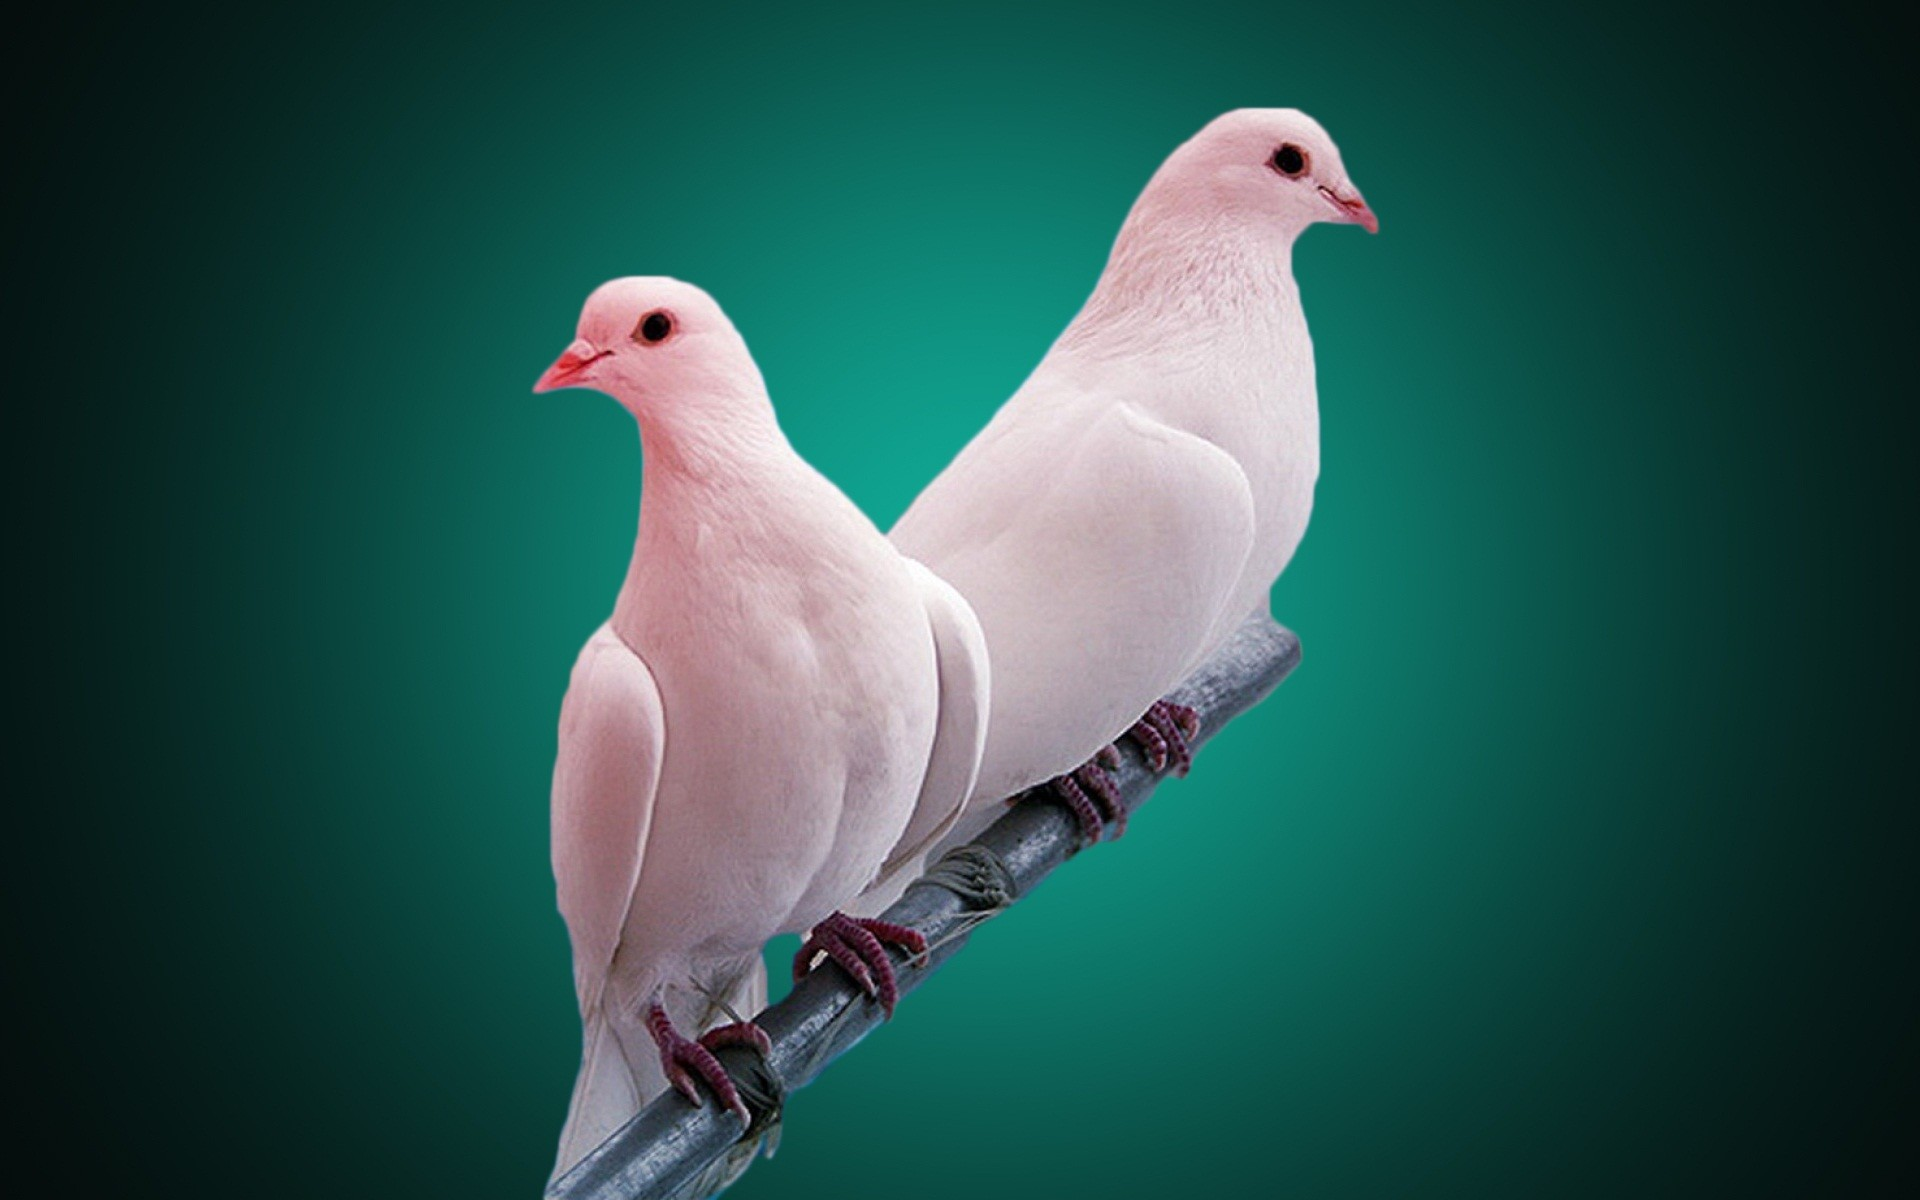 Great Wallpaper Love Parrot - 778679-most-popular-lovebird-wallpaper-1920x1200-large-resolution  Pictures_597049.jpg